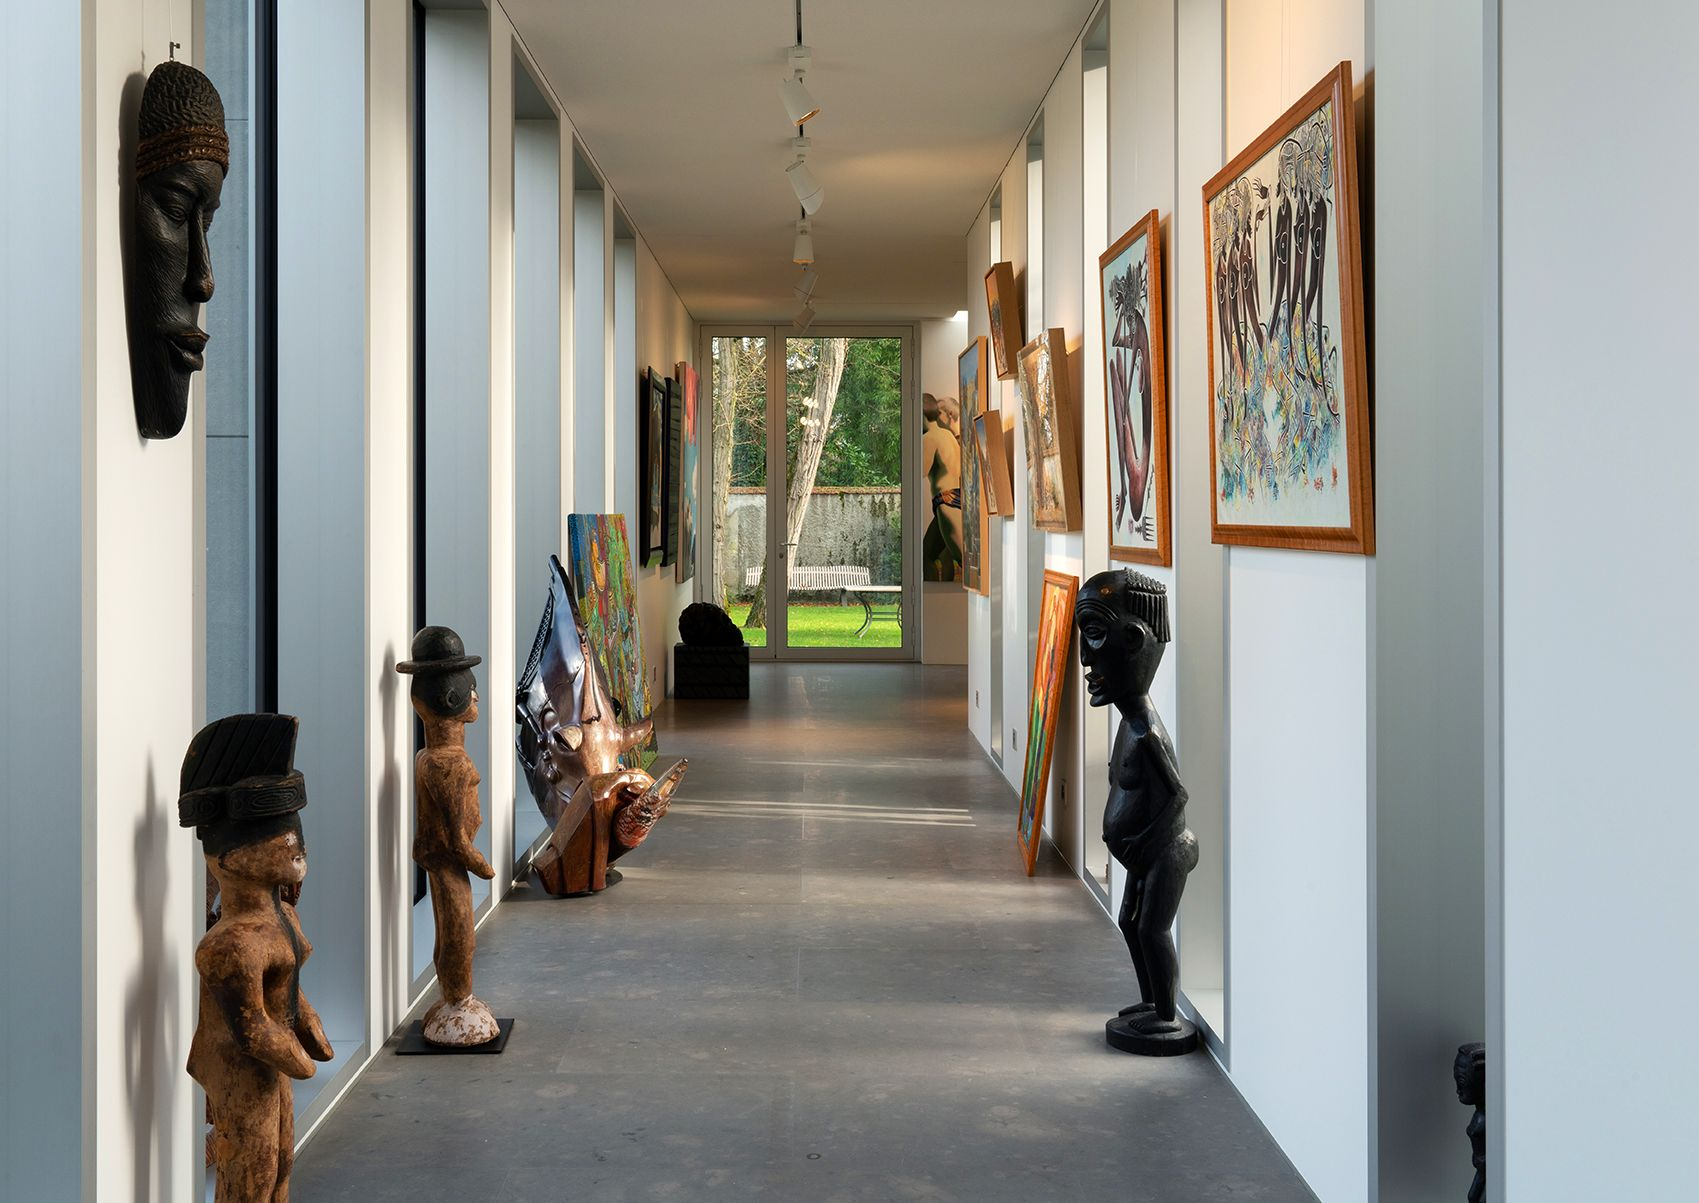 Villa in Svizzera - image 23